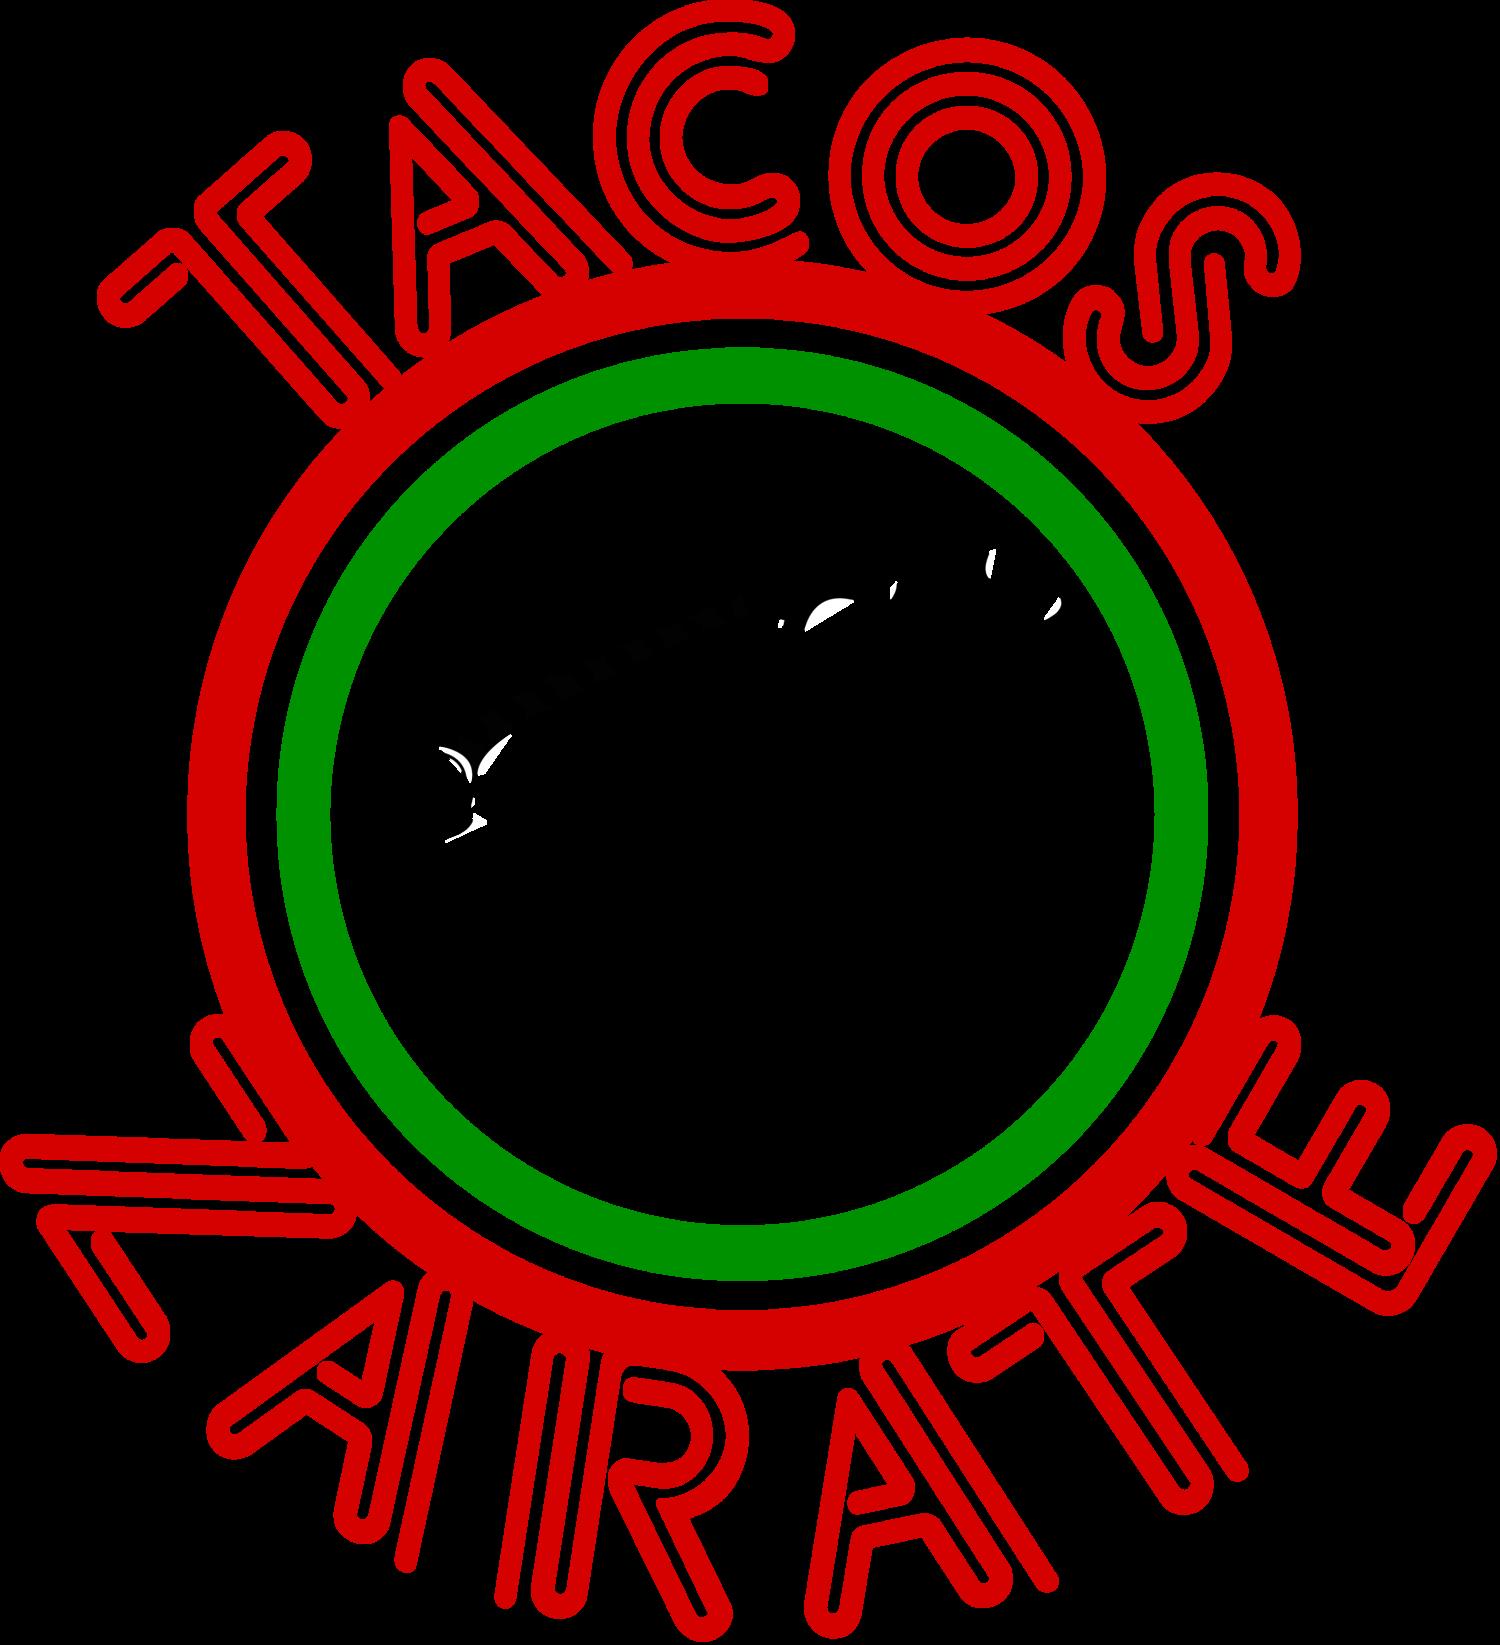 Zarate . Tacos clipart crunchy